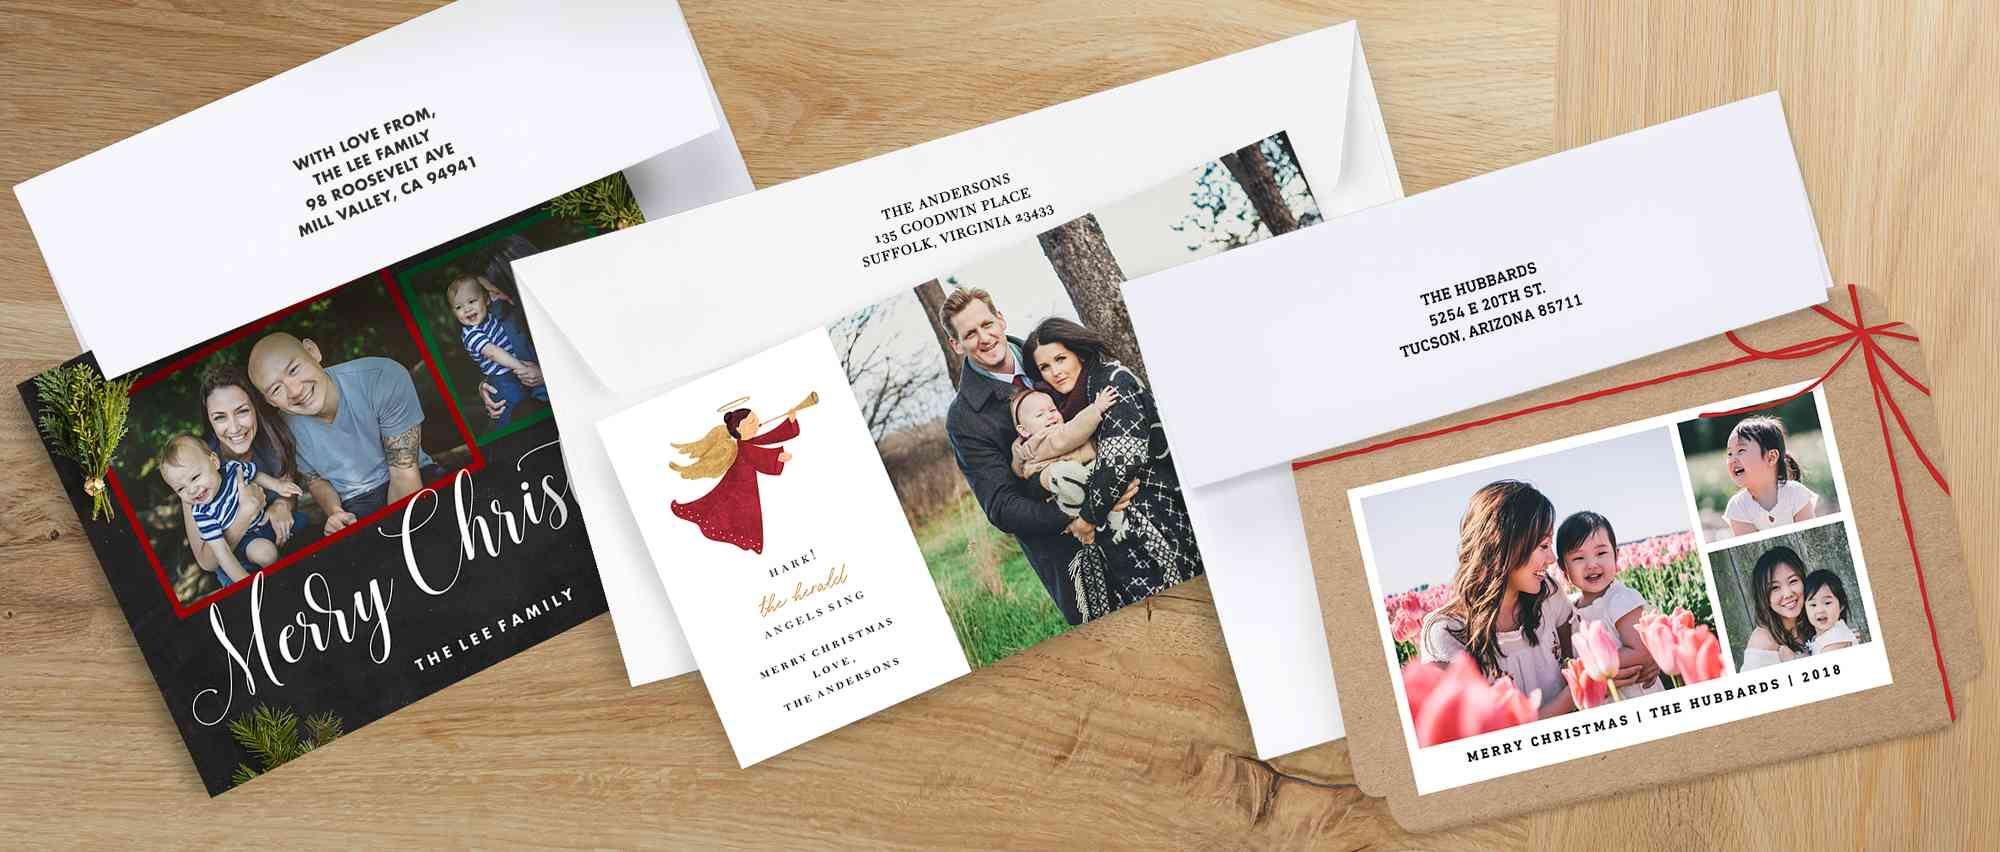 Snapfish Christmas Cards.Photo Cards Holiday Photo Cards Christmas Cards